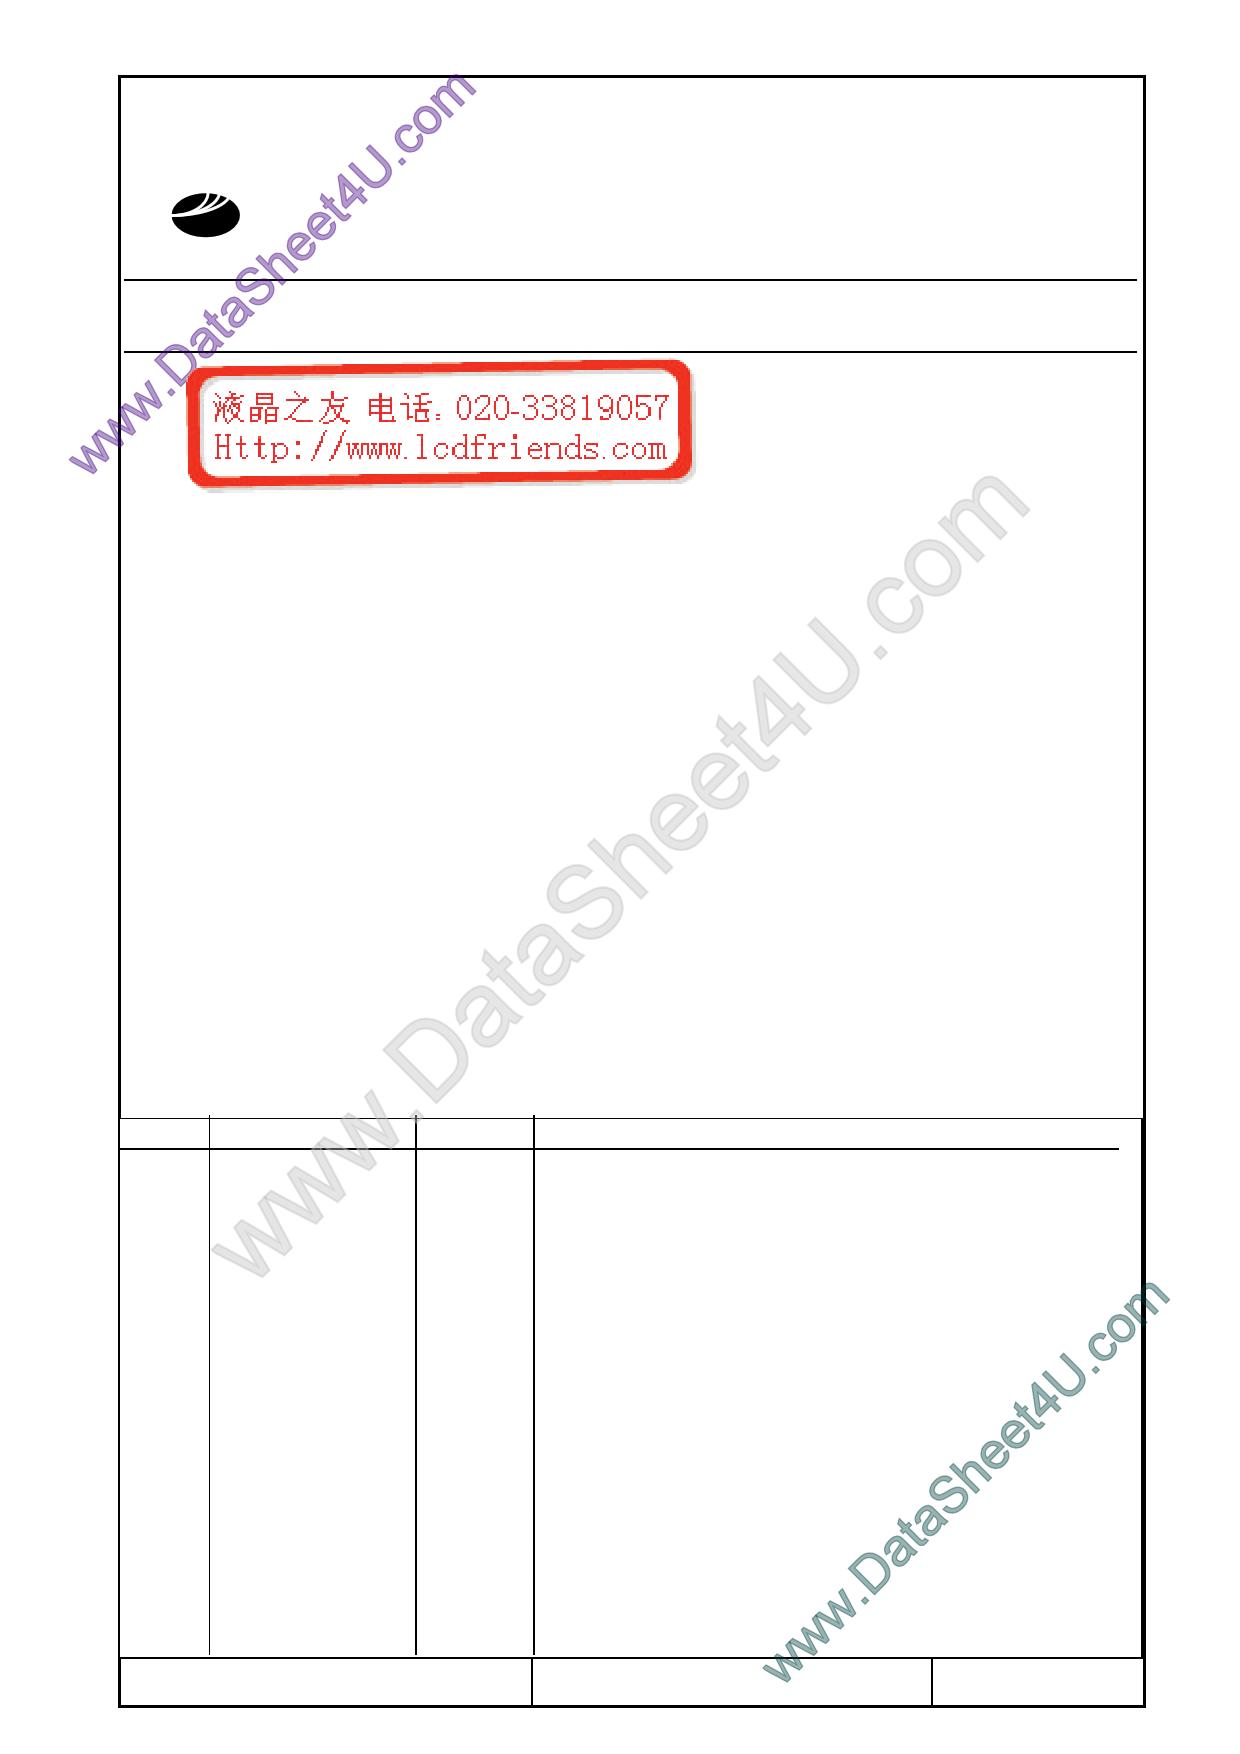 T-51380L050J_FW_P_AC datasheet